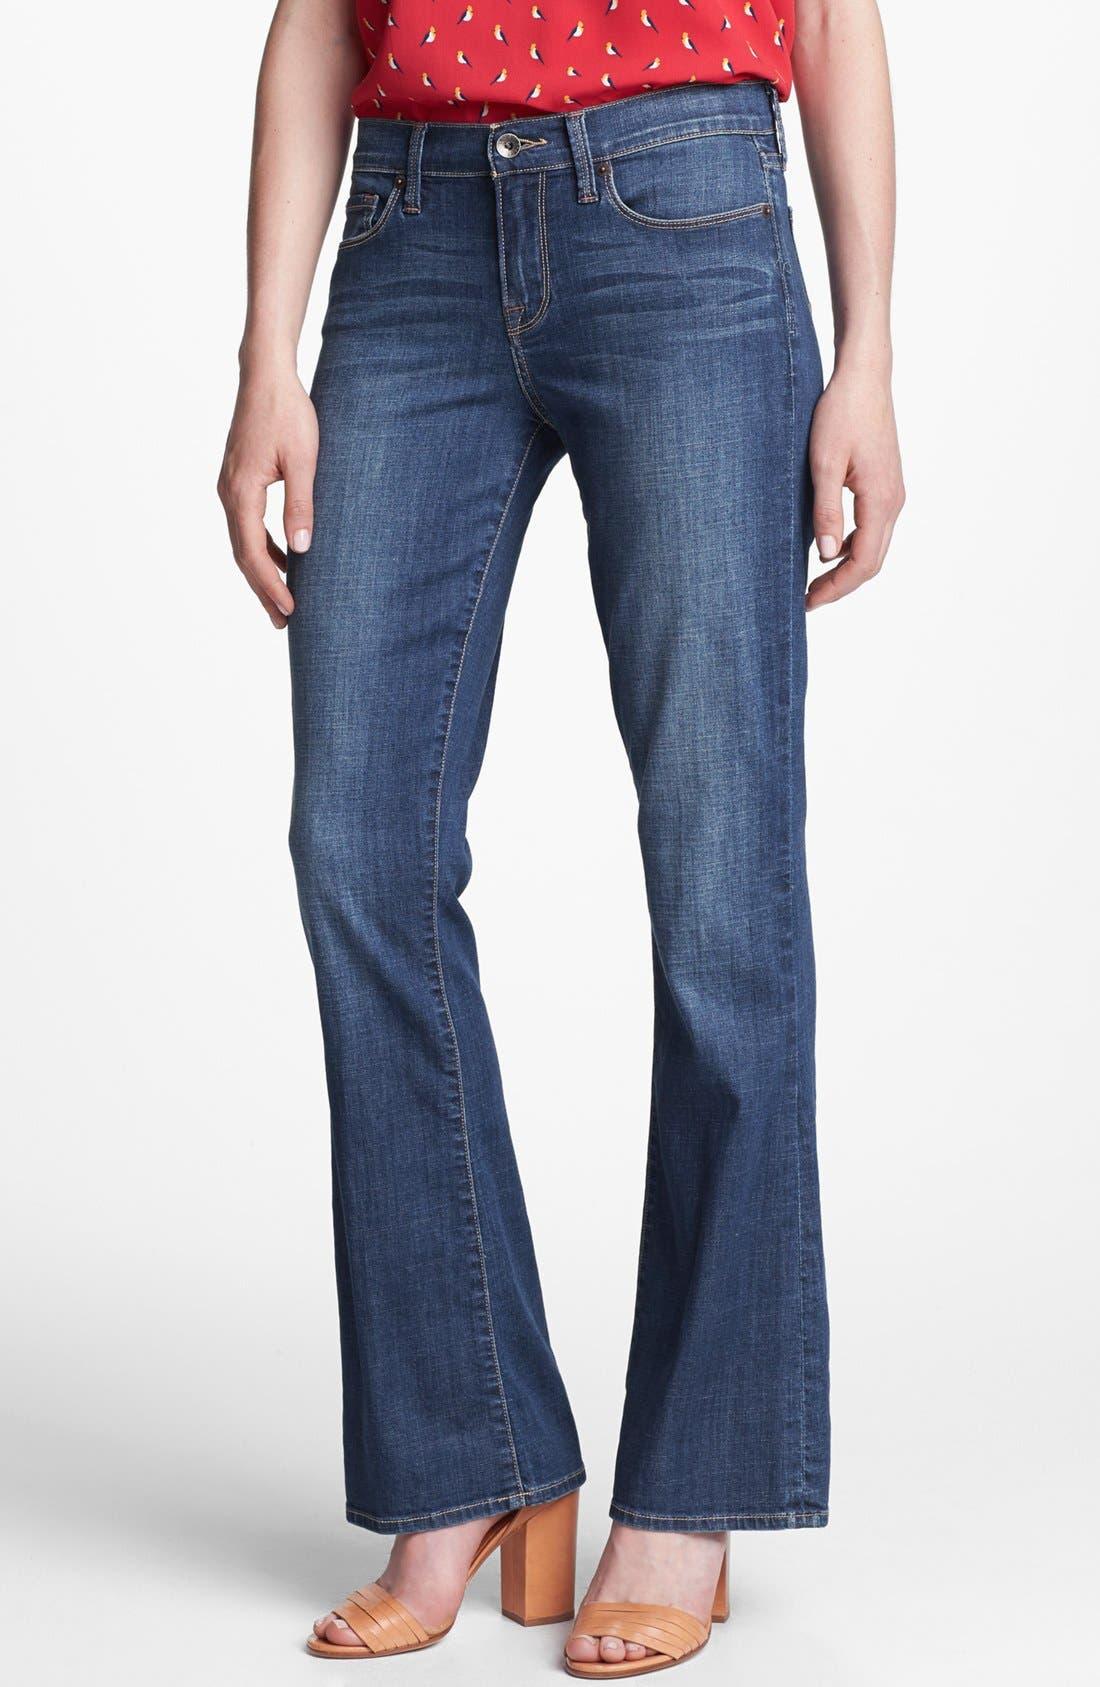 Main Image - Lucky Brand 'Sofia' Bootcut Jeans (Medium Olive)